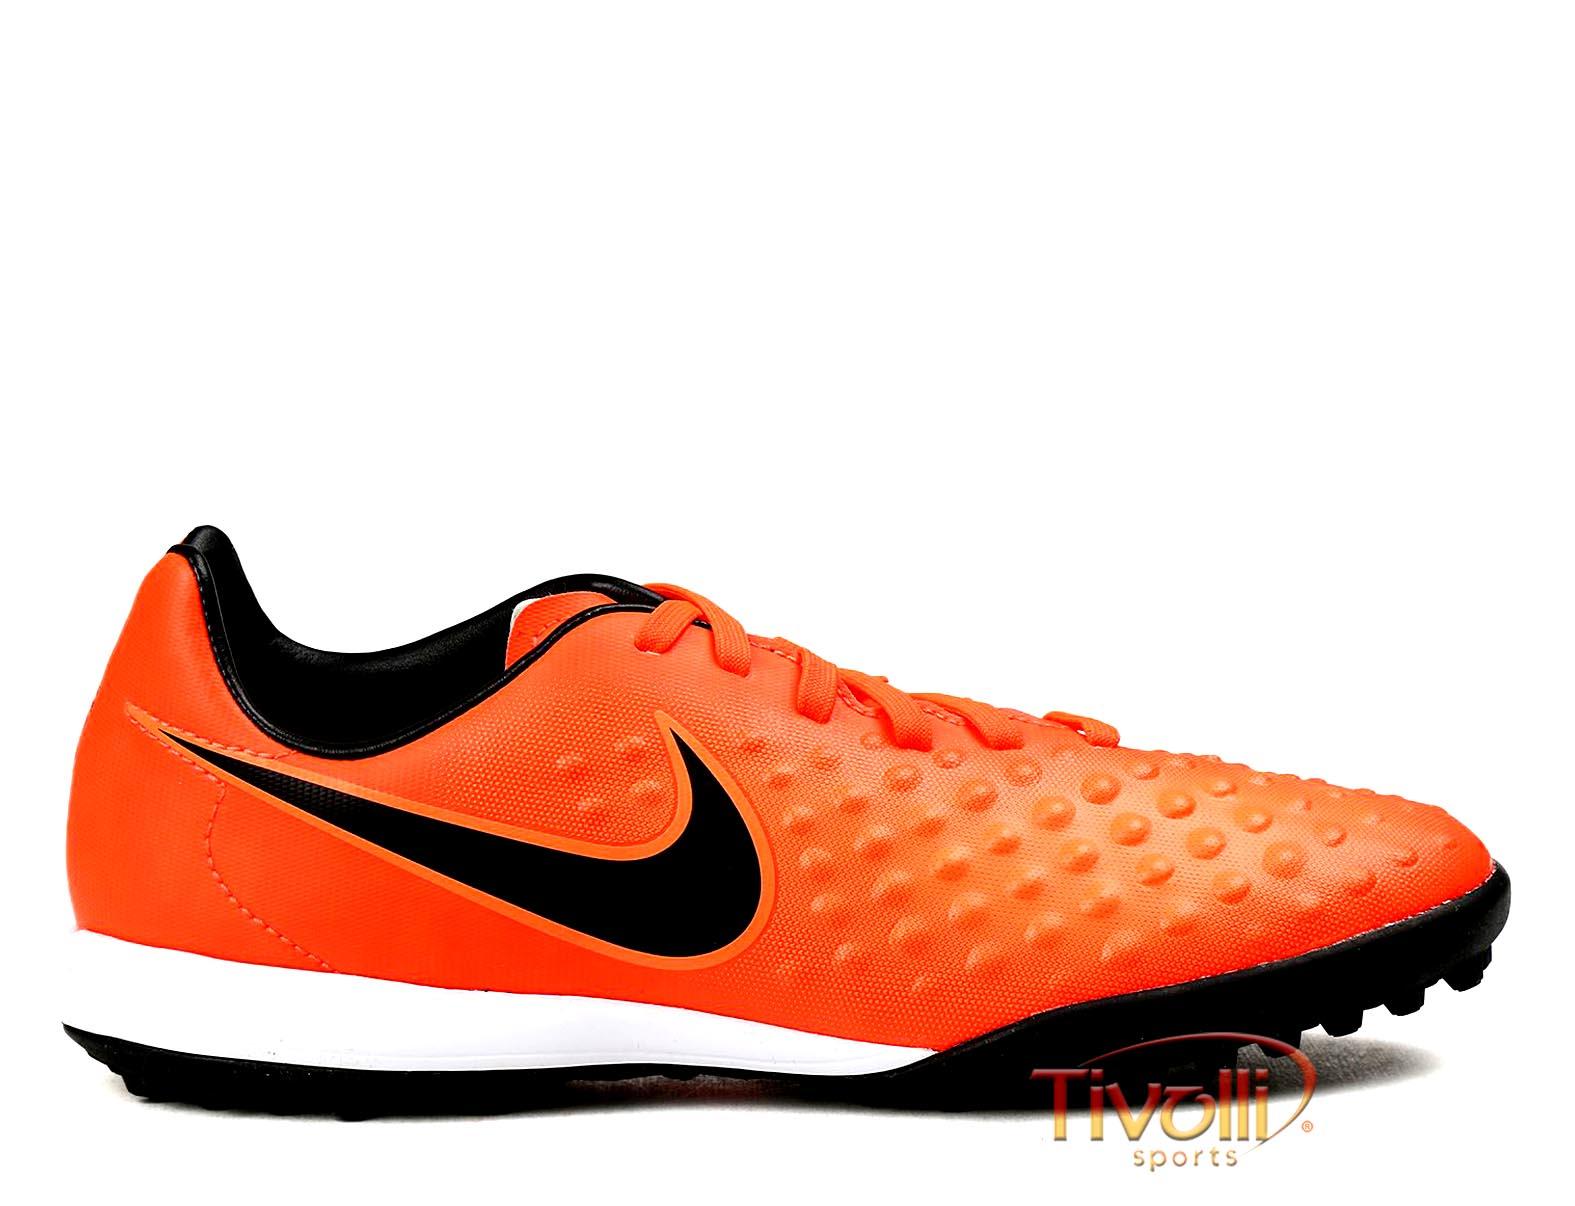 Chuteira Nike Jr. Magista Opus II TF Society Infantil     2180aa485d2d4